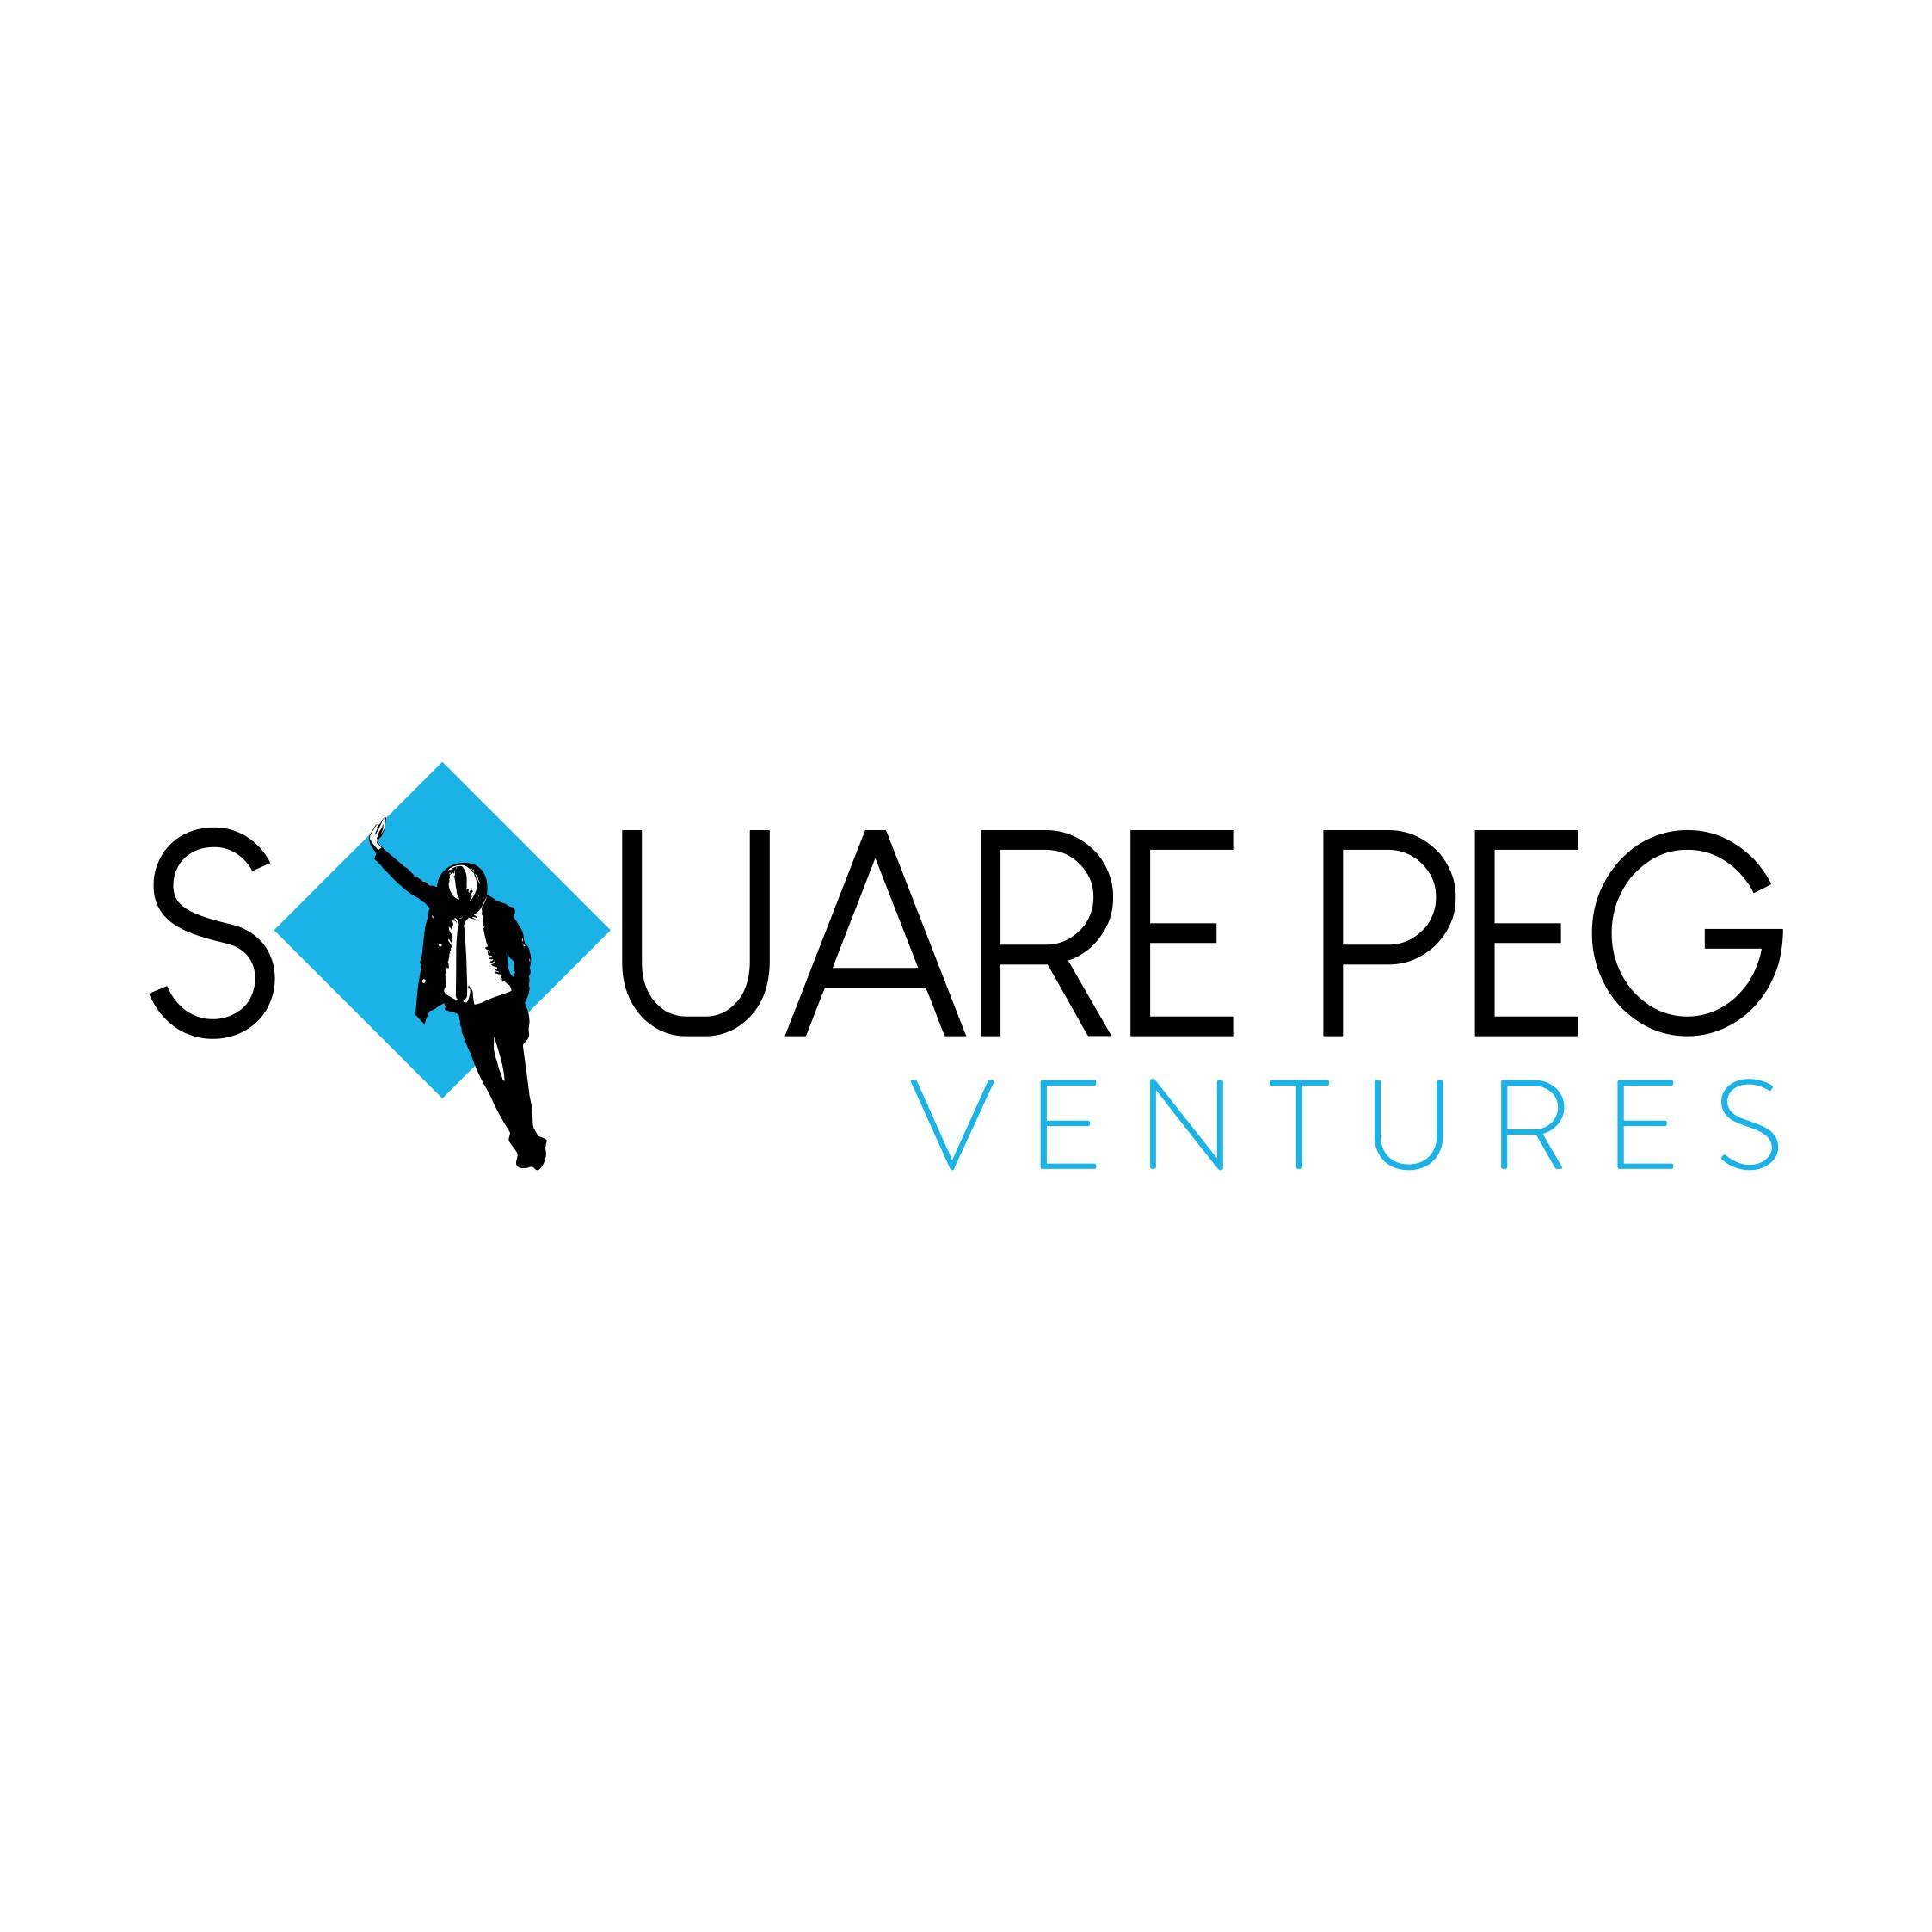 New VC group seeking logo befitting professionals with attitude